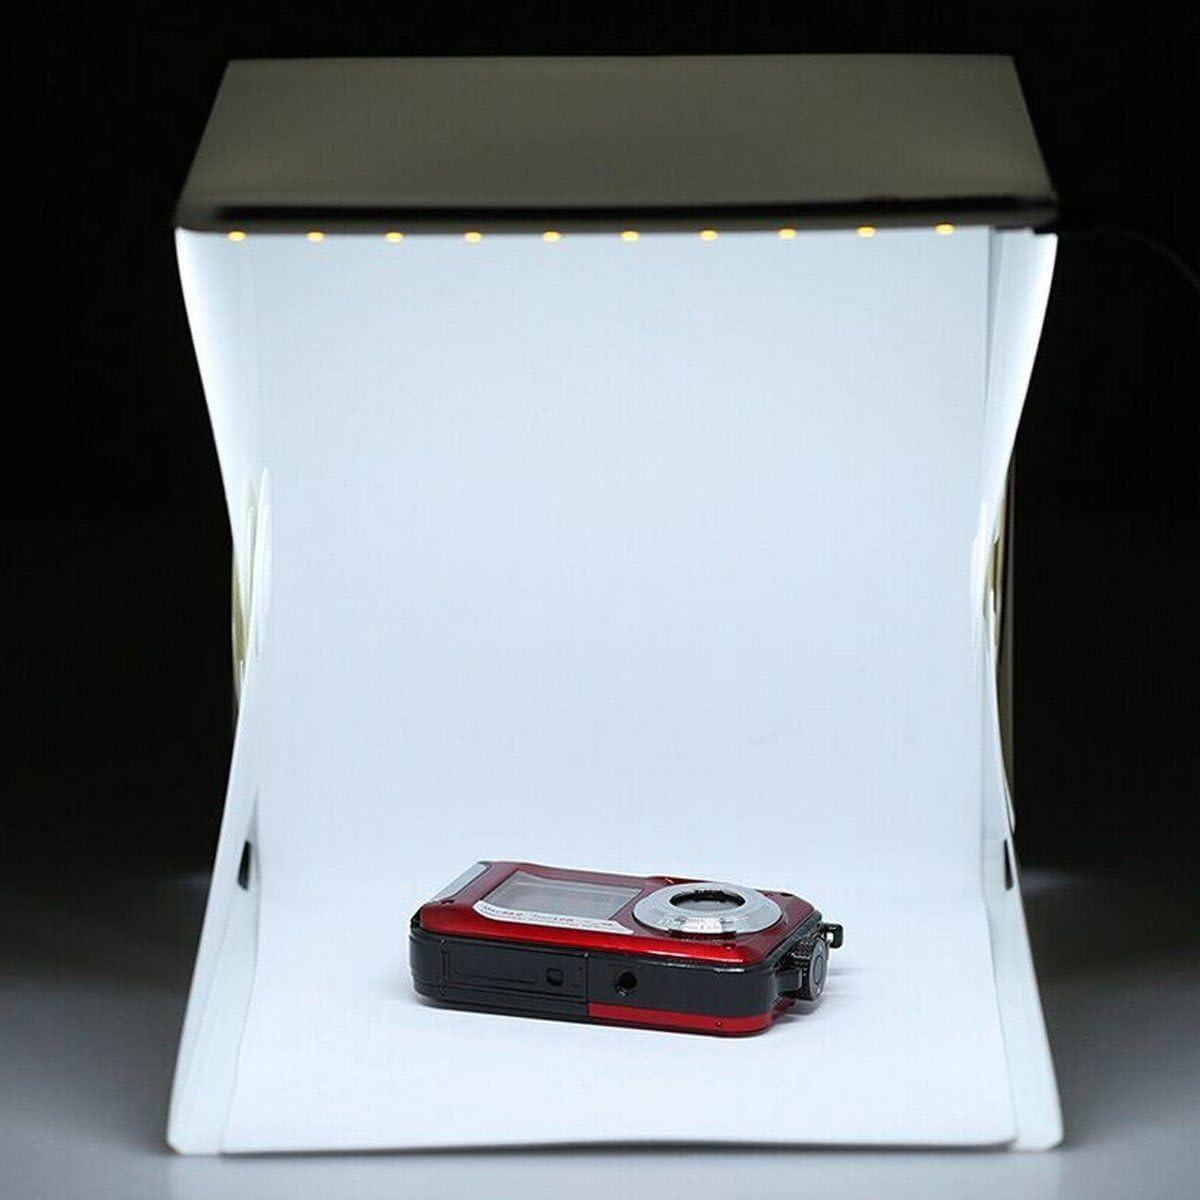 SOLEDI White Distinctive Mini Photography Box Photo Studio Lighting Light Room Foldable Mini Light Room 9 Camera Cube Creative